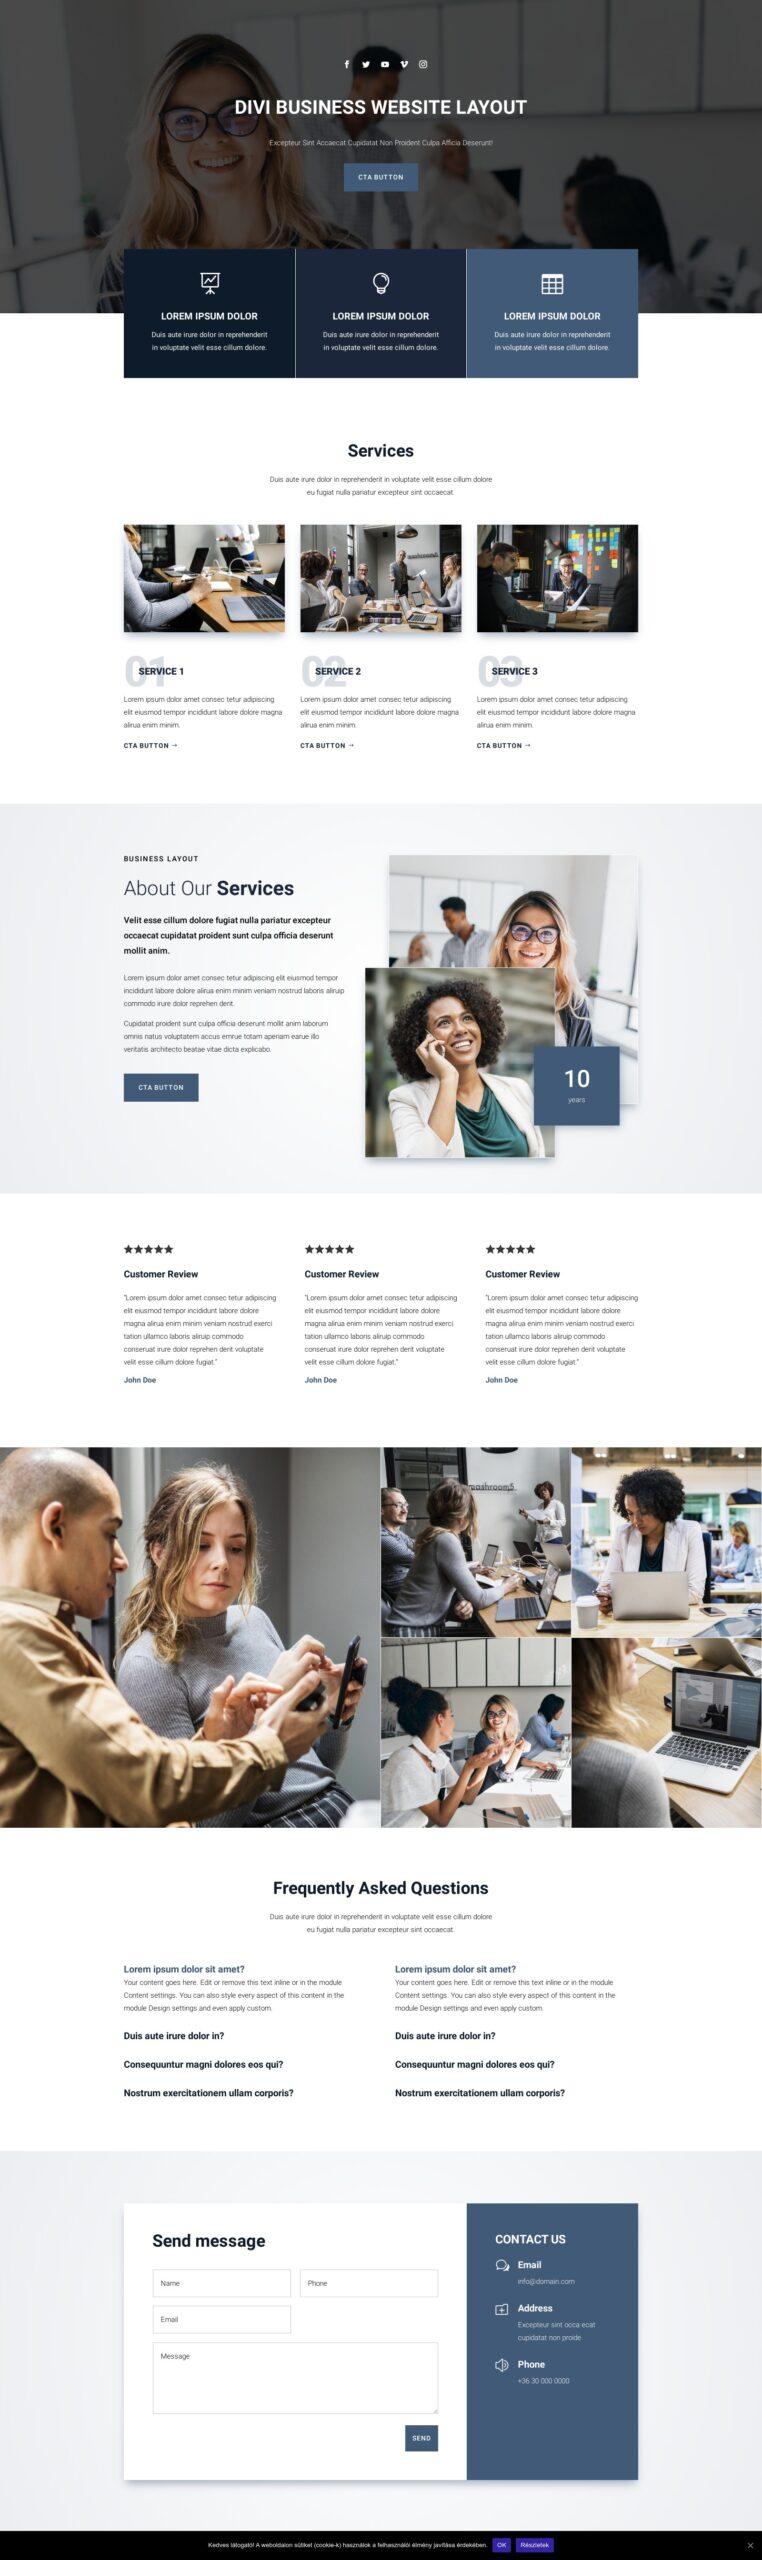 Business Layout 02 – DMP